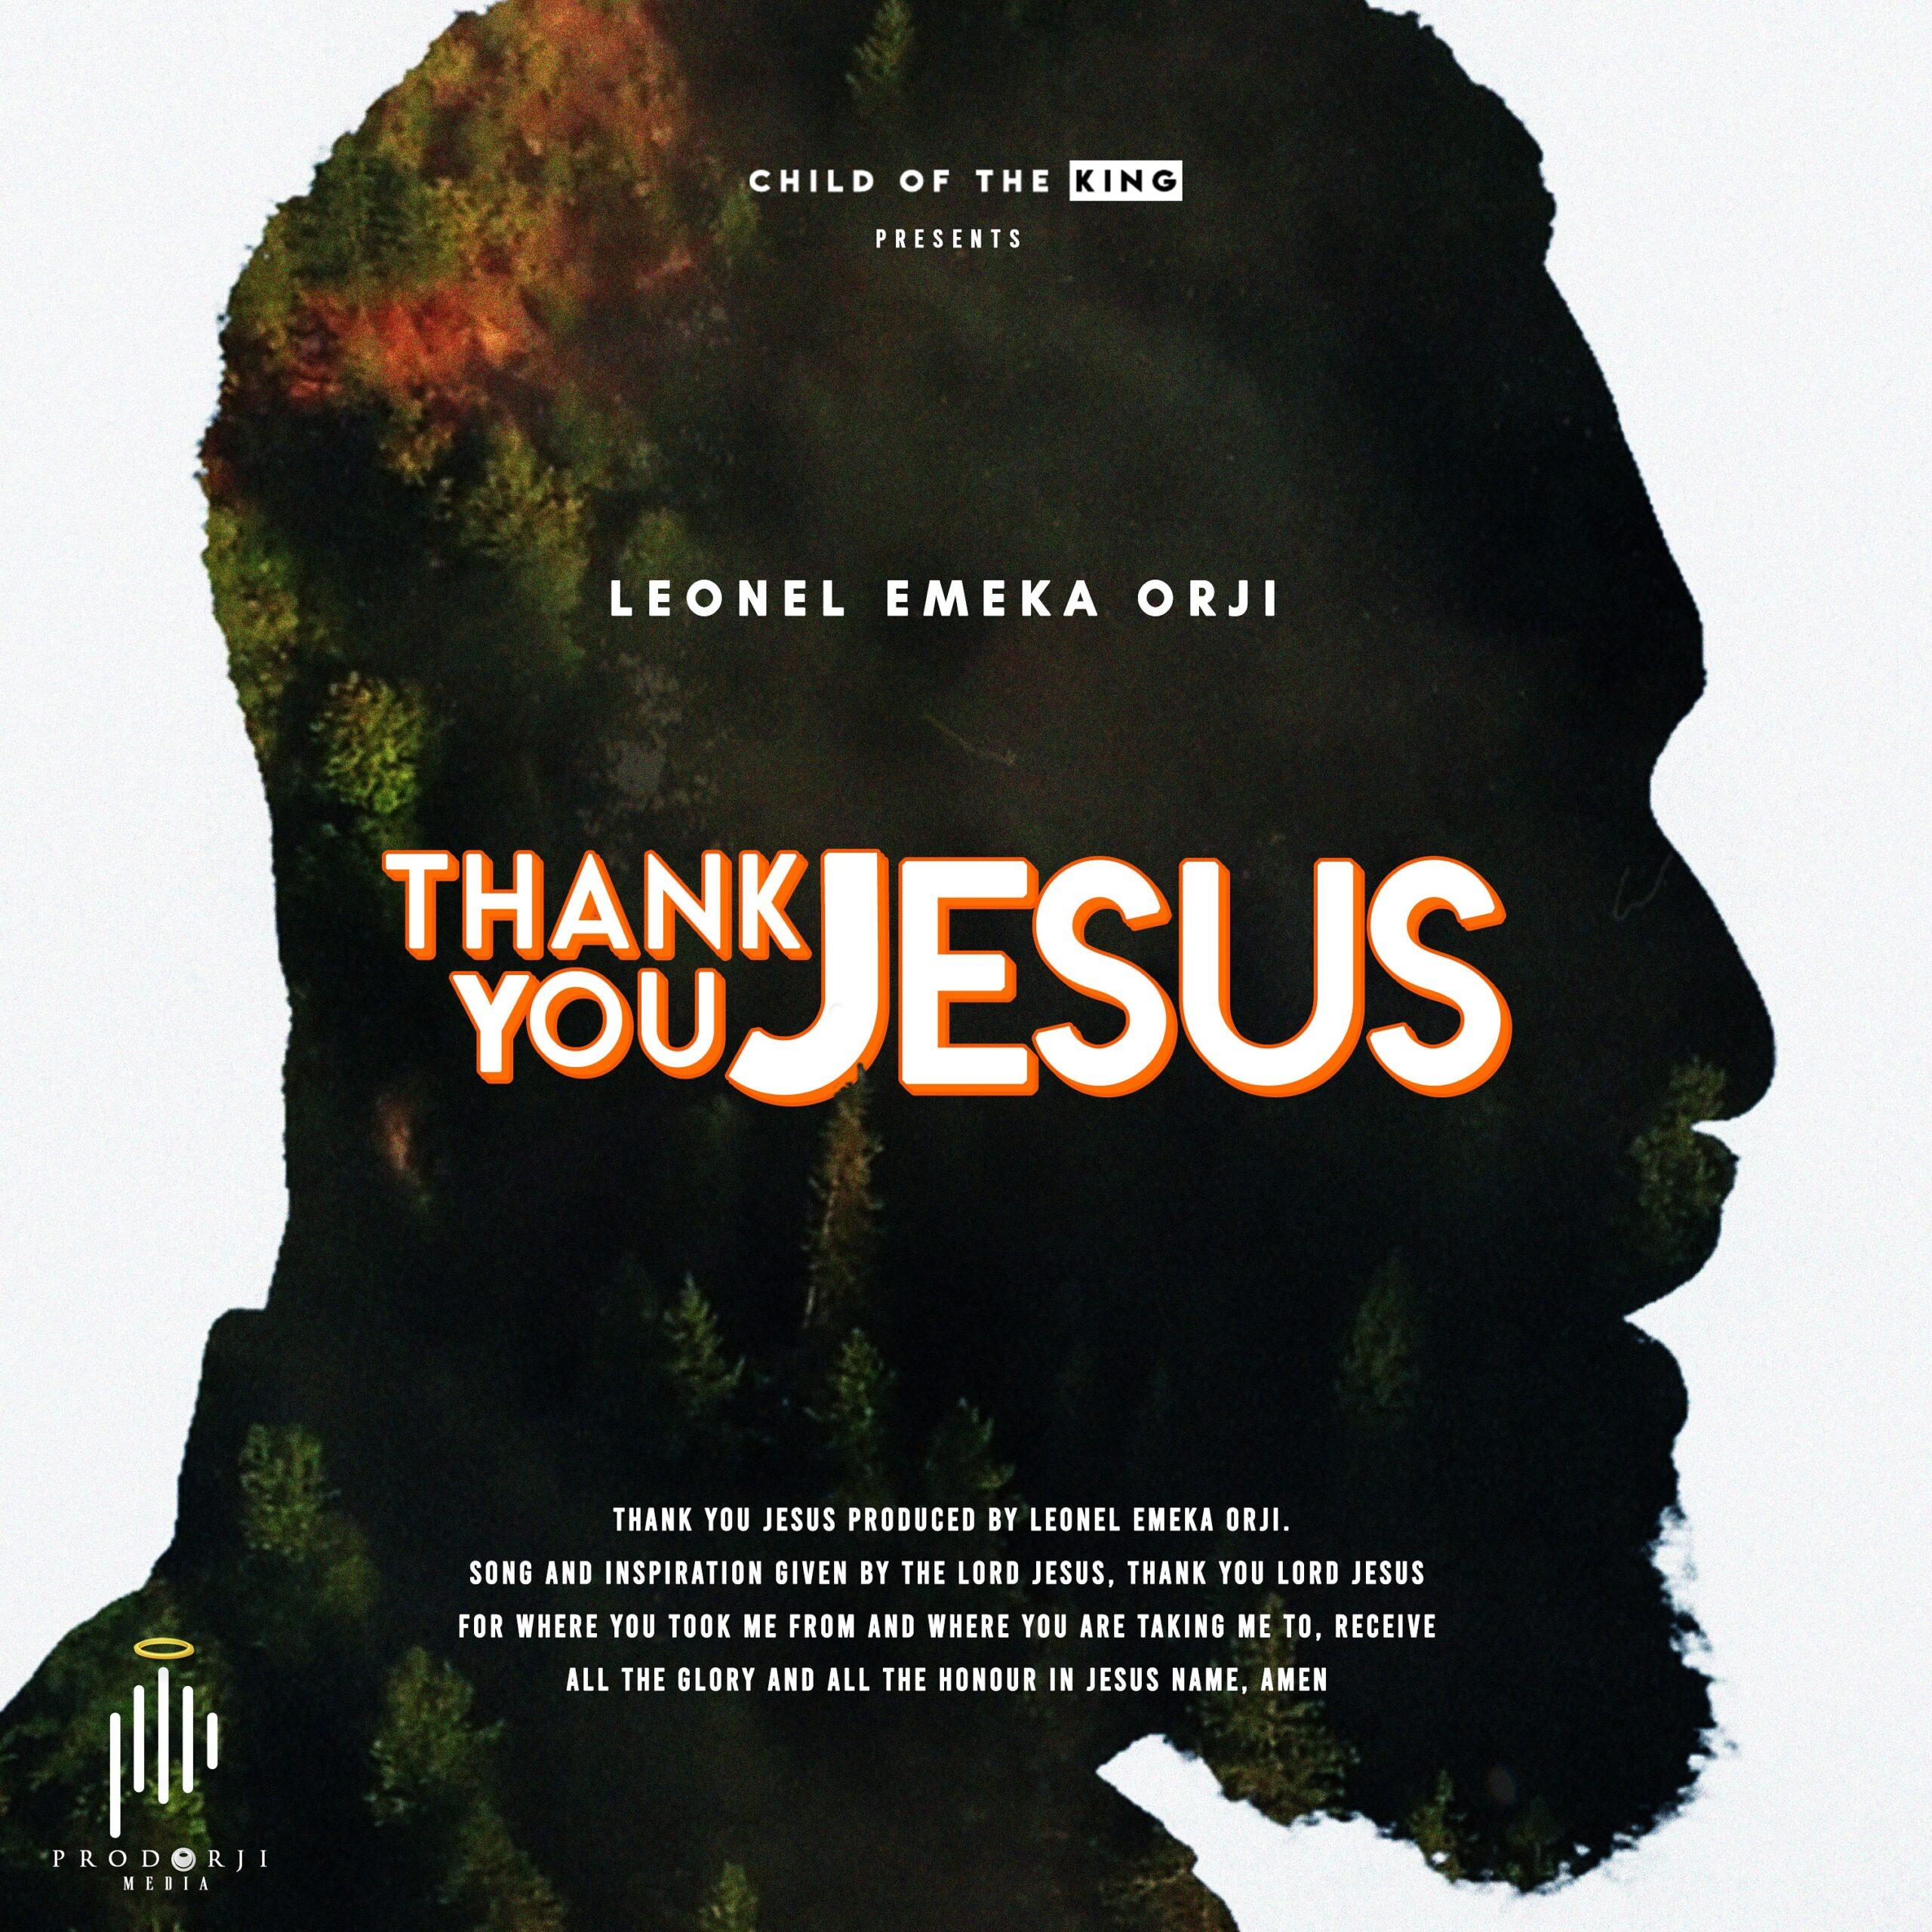 Leonel Emeka Orji - Thank You Jesus